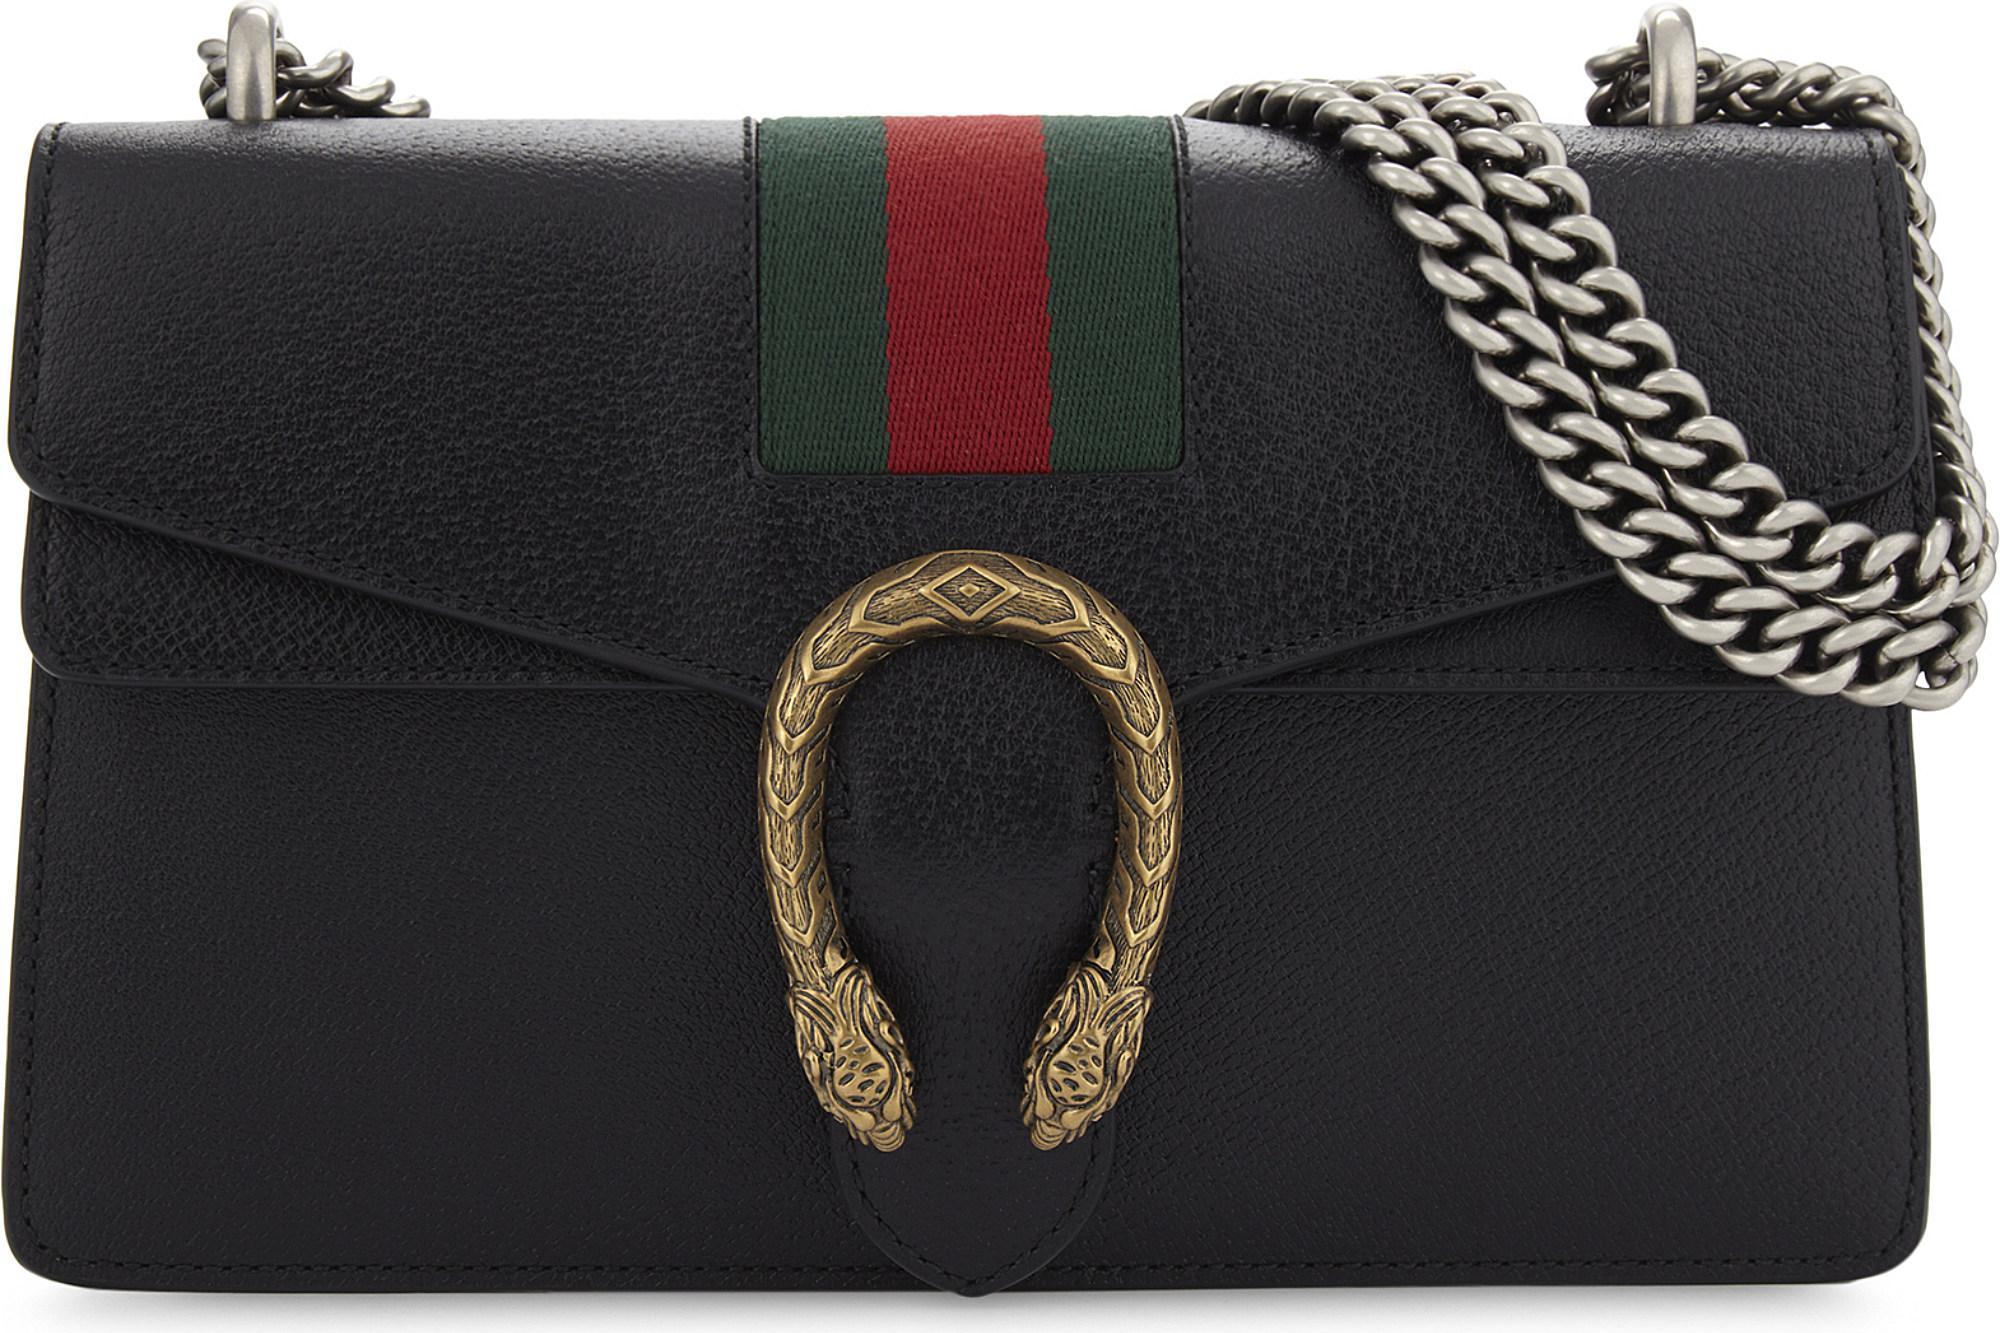 6e6d752b2 Gucci Dionysus Web Stripe Small Leather Shoulder Bag in Black - Lyst